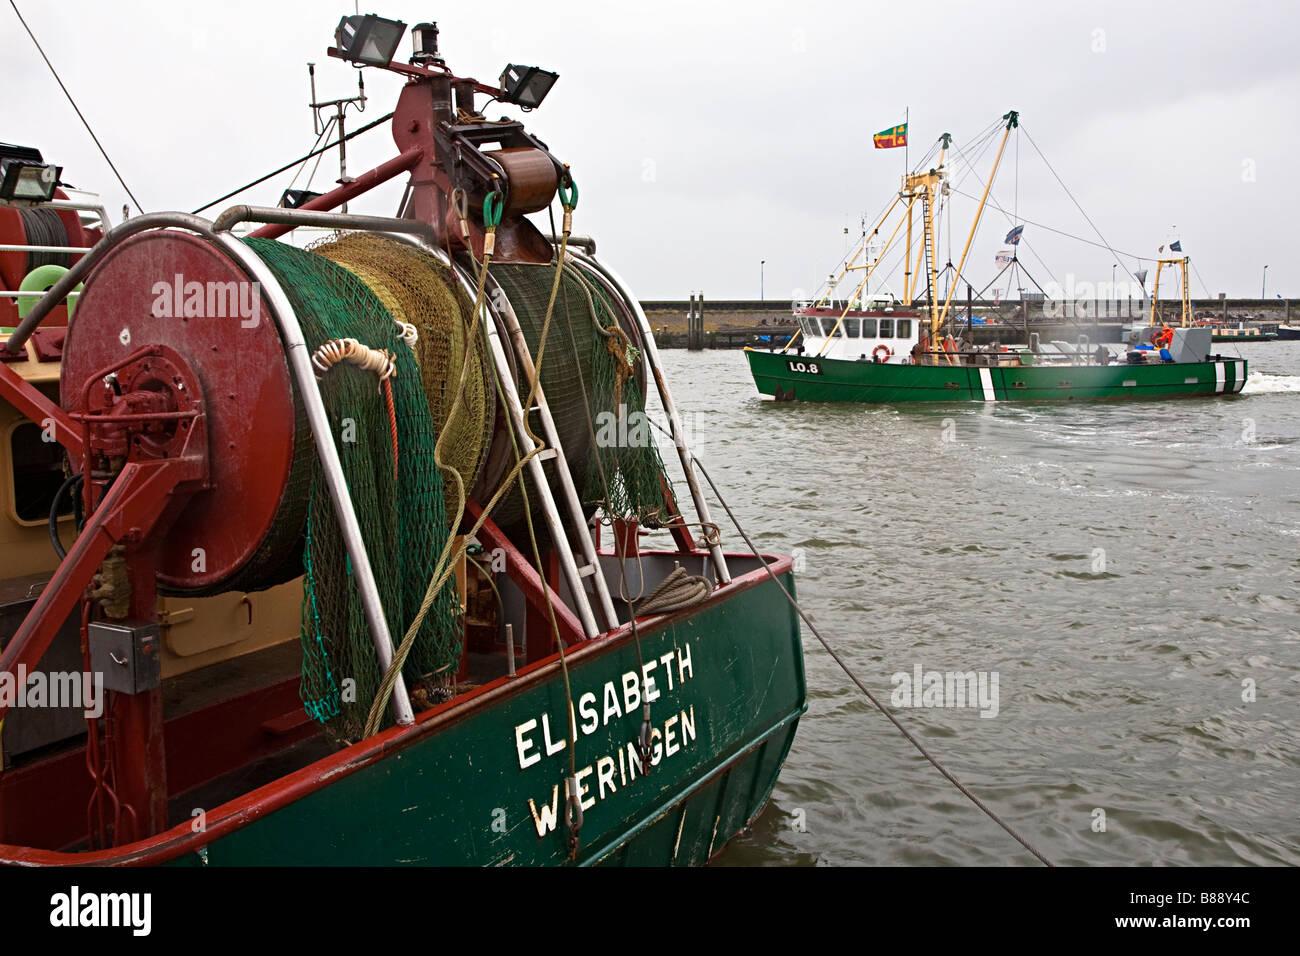 Fishing boats leaving harbour Den Oever Wieringen Netherlands - Stock Image